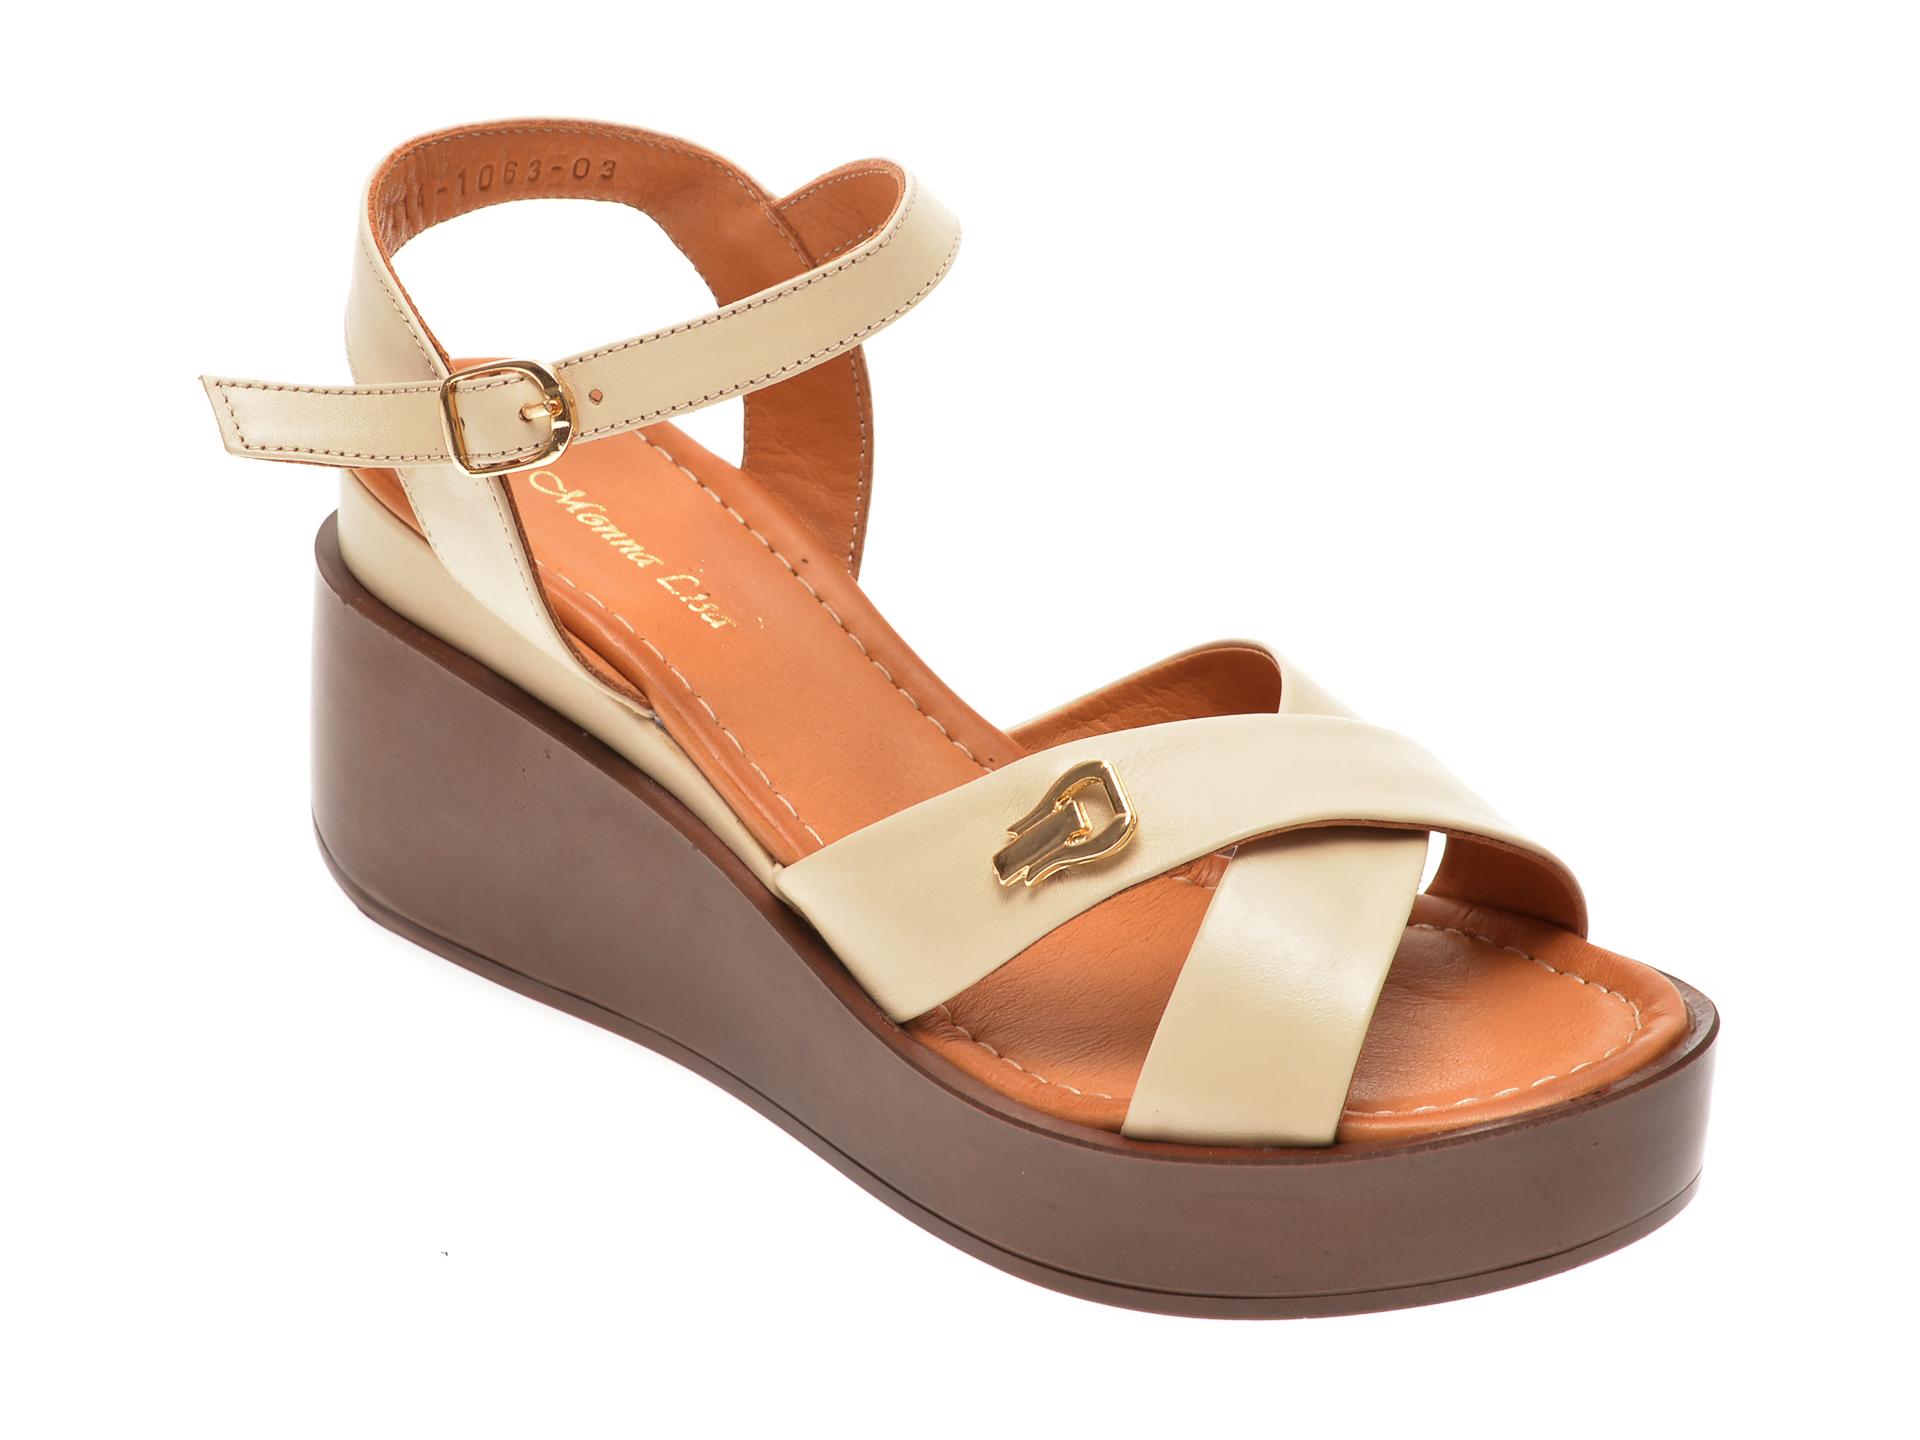 Sandale MISS LIZA bej, 1181063, din piele naturala imagine